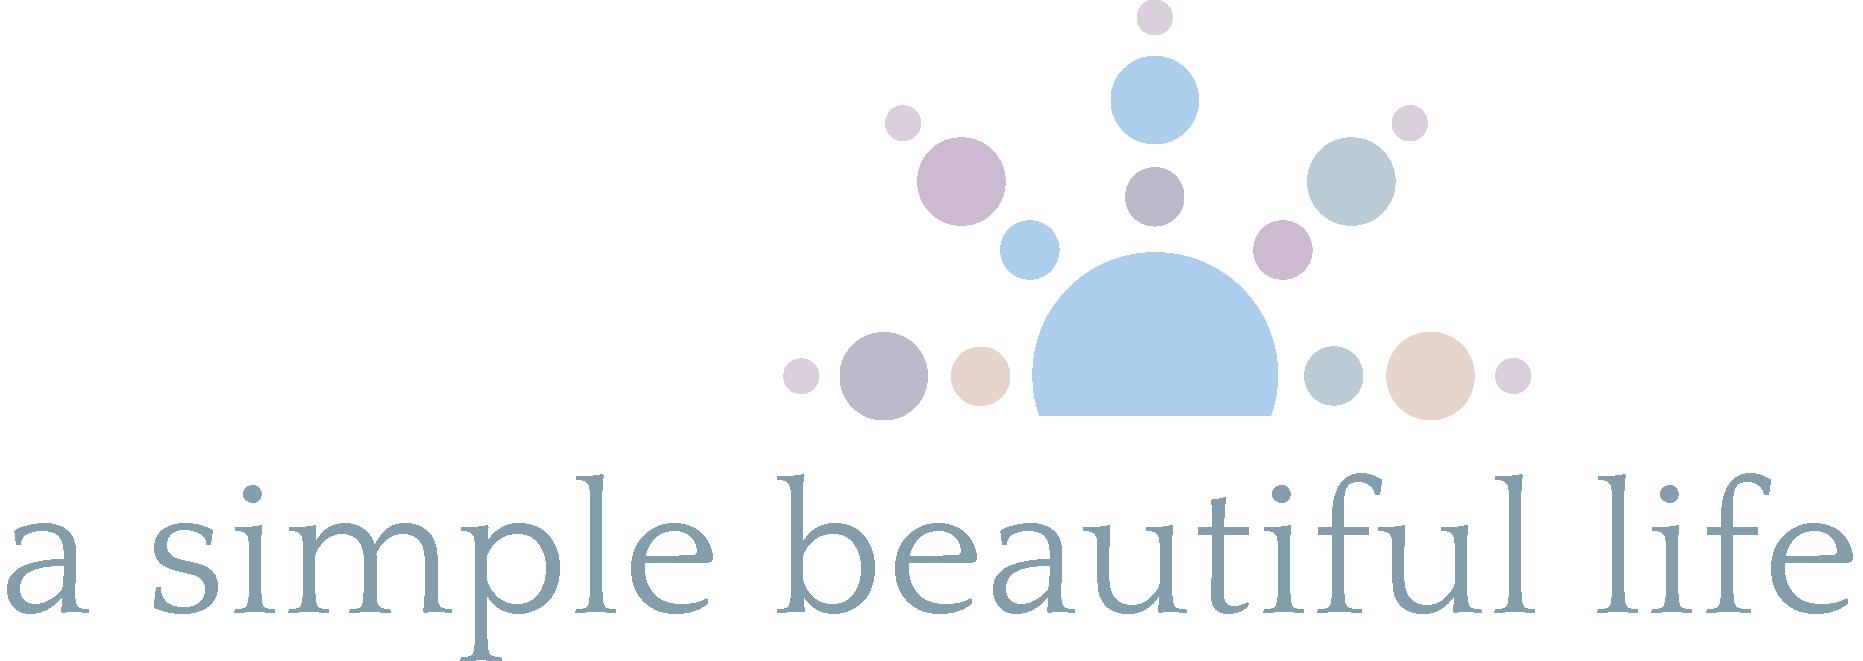 simple beautiful life logo